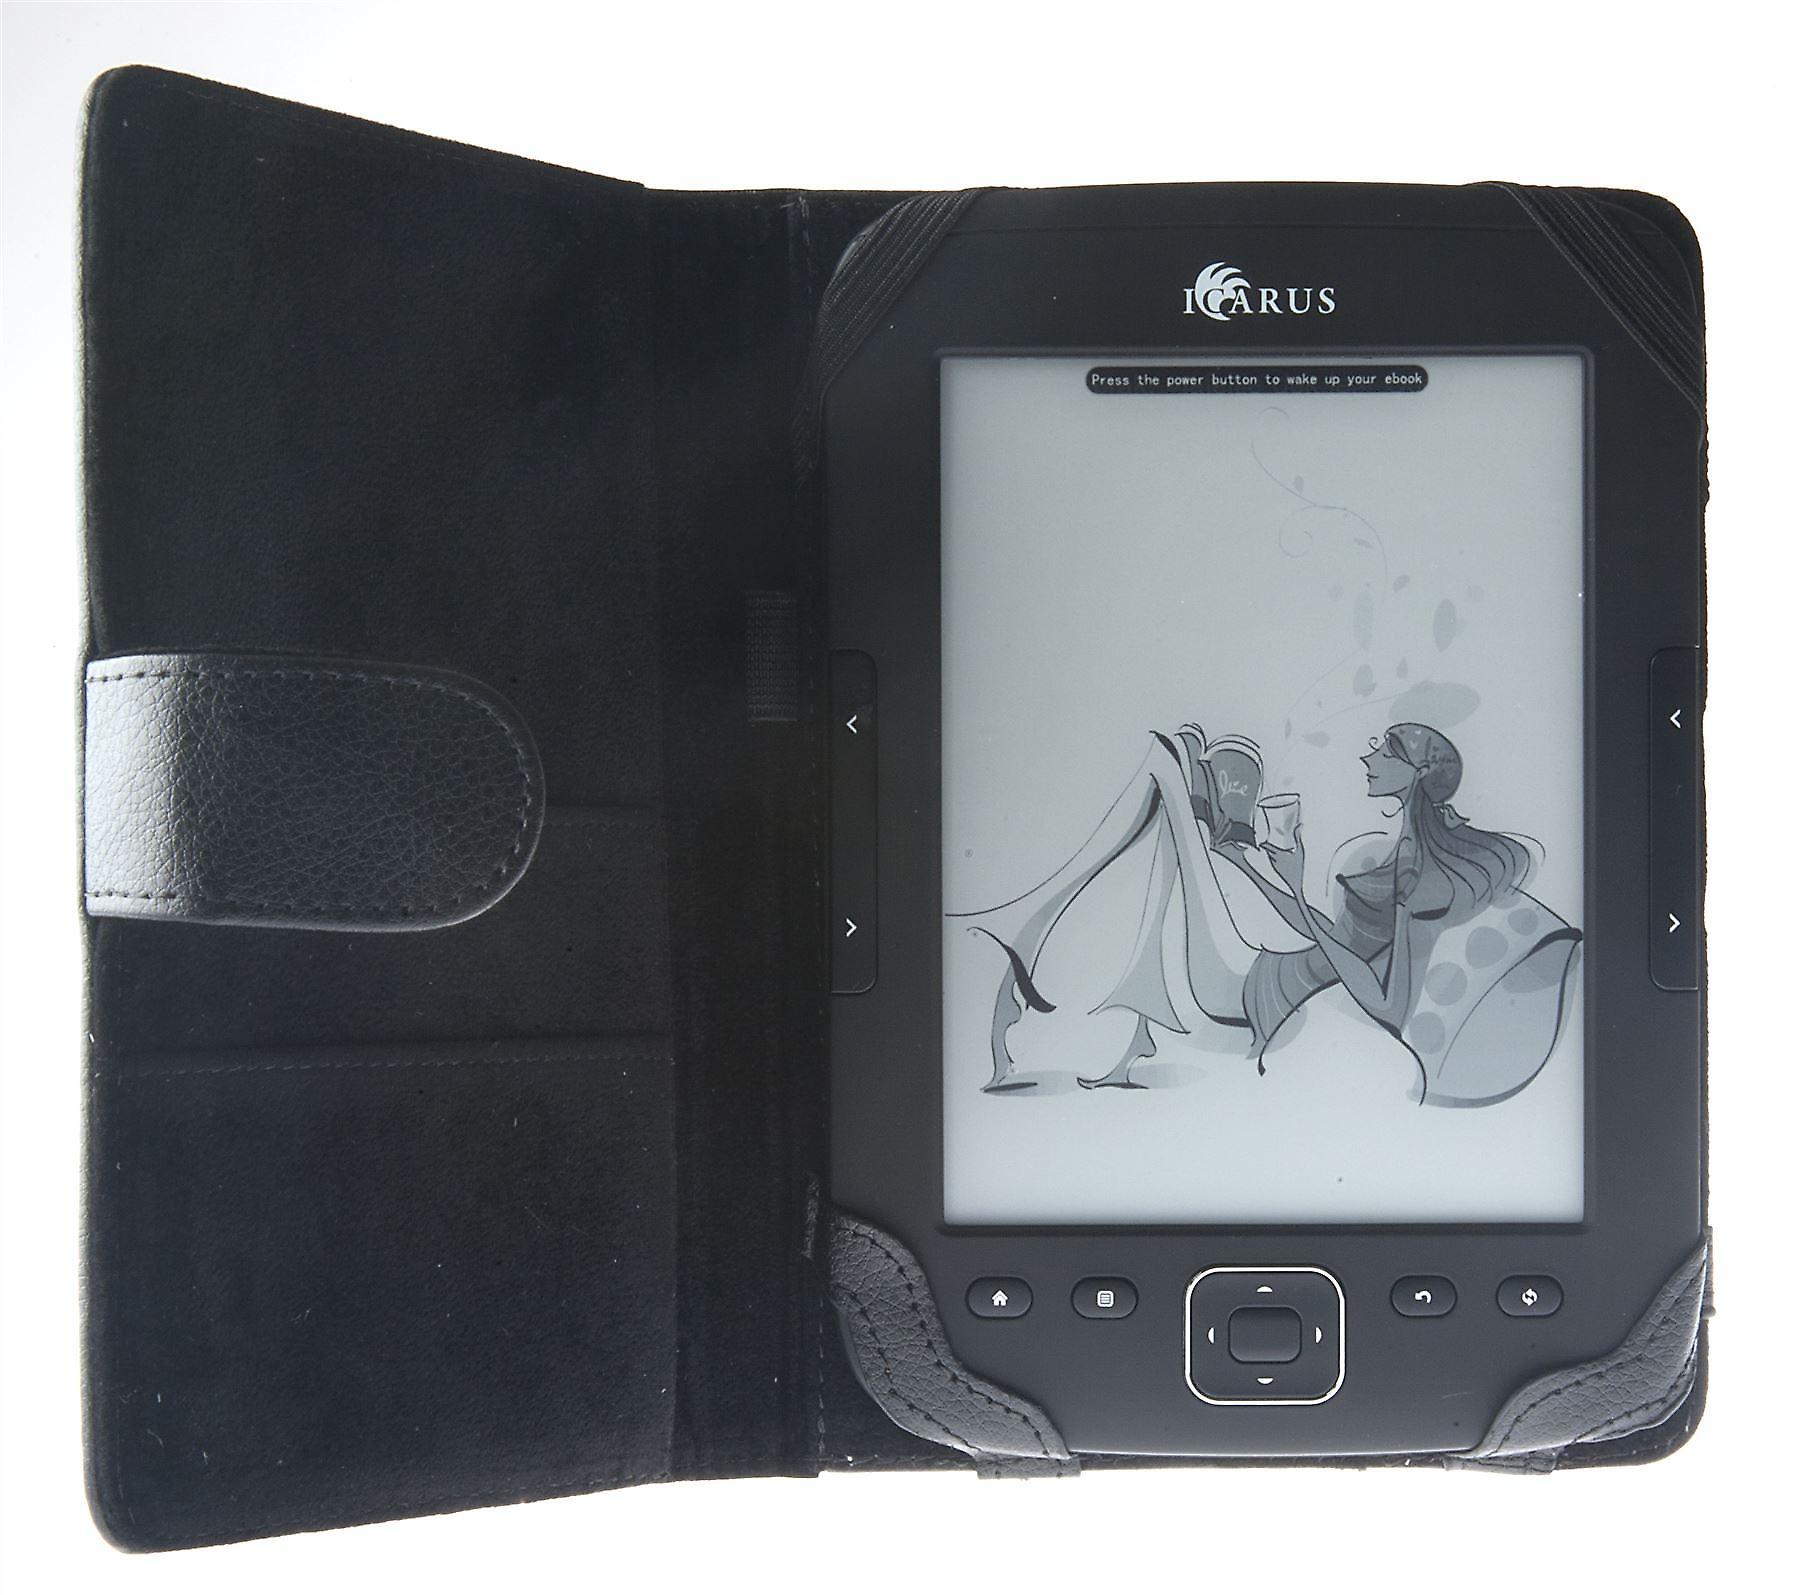 ICARUS cover black leather for Illumina HD/Pocket/Sense G2